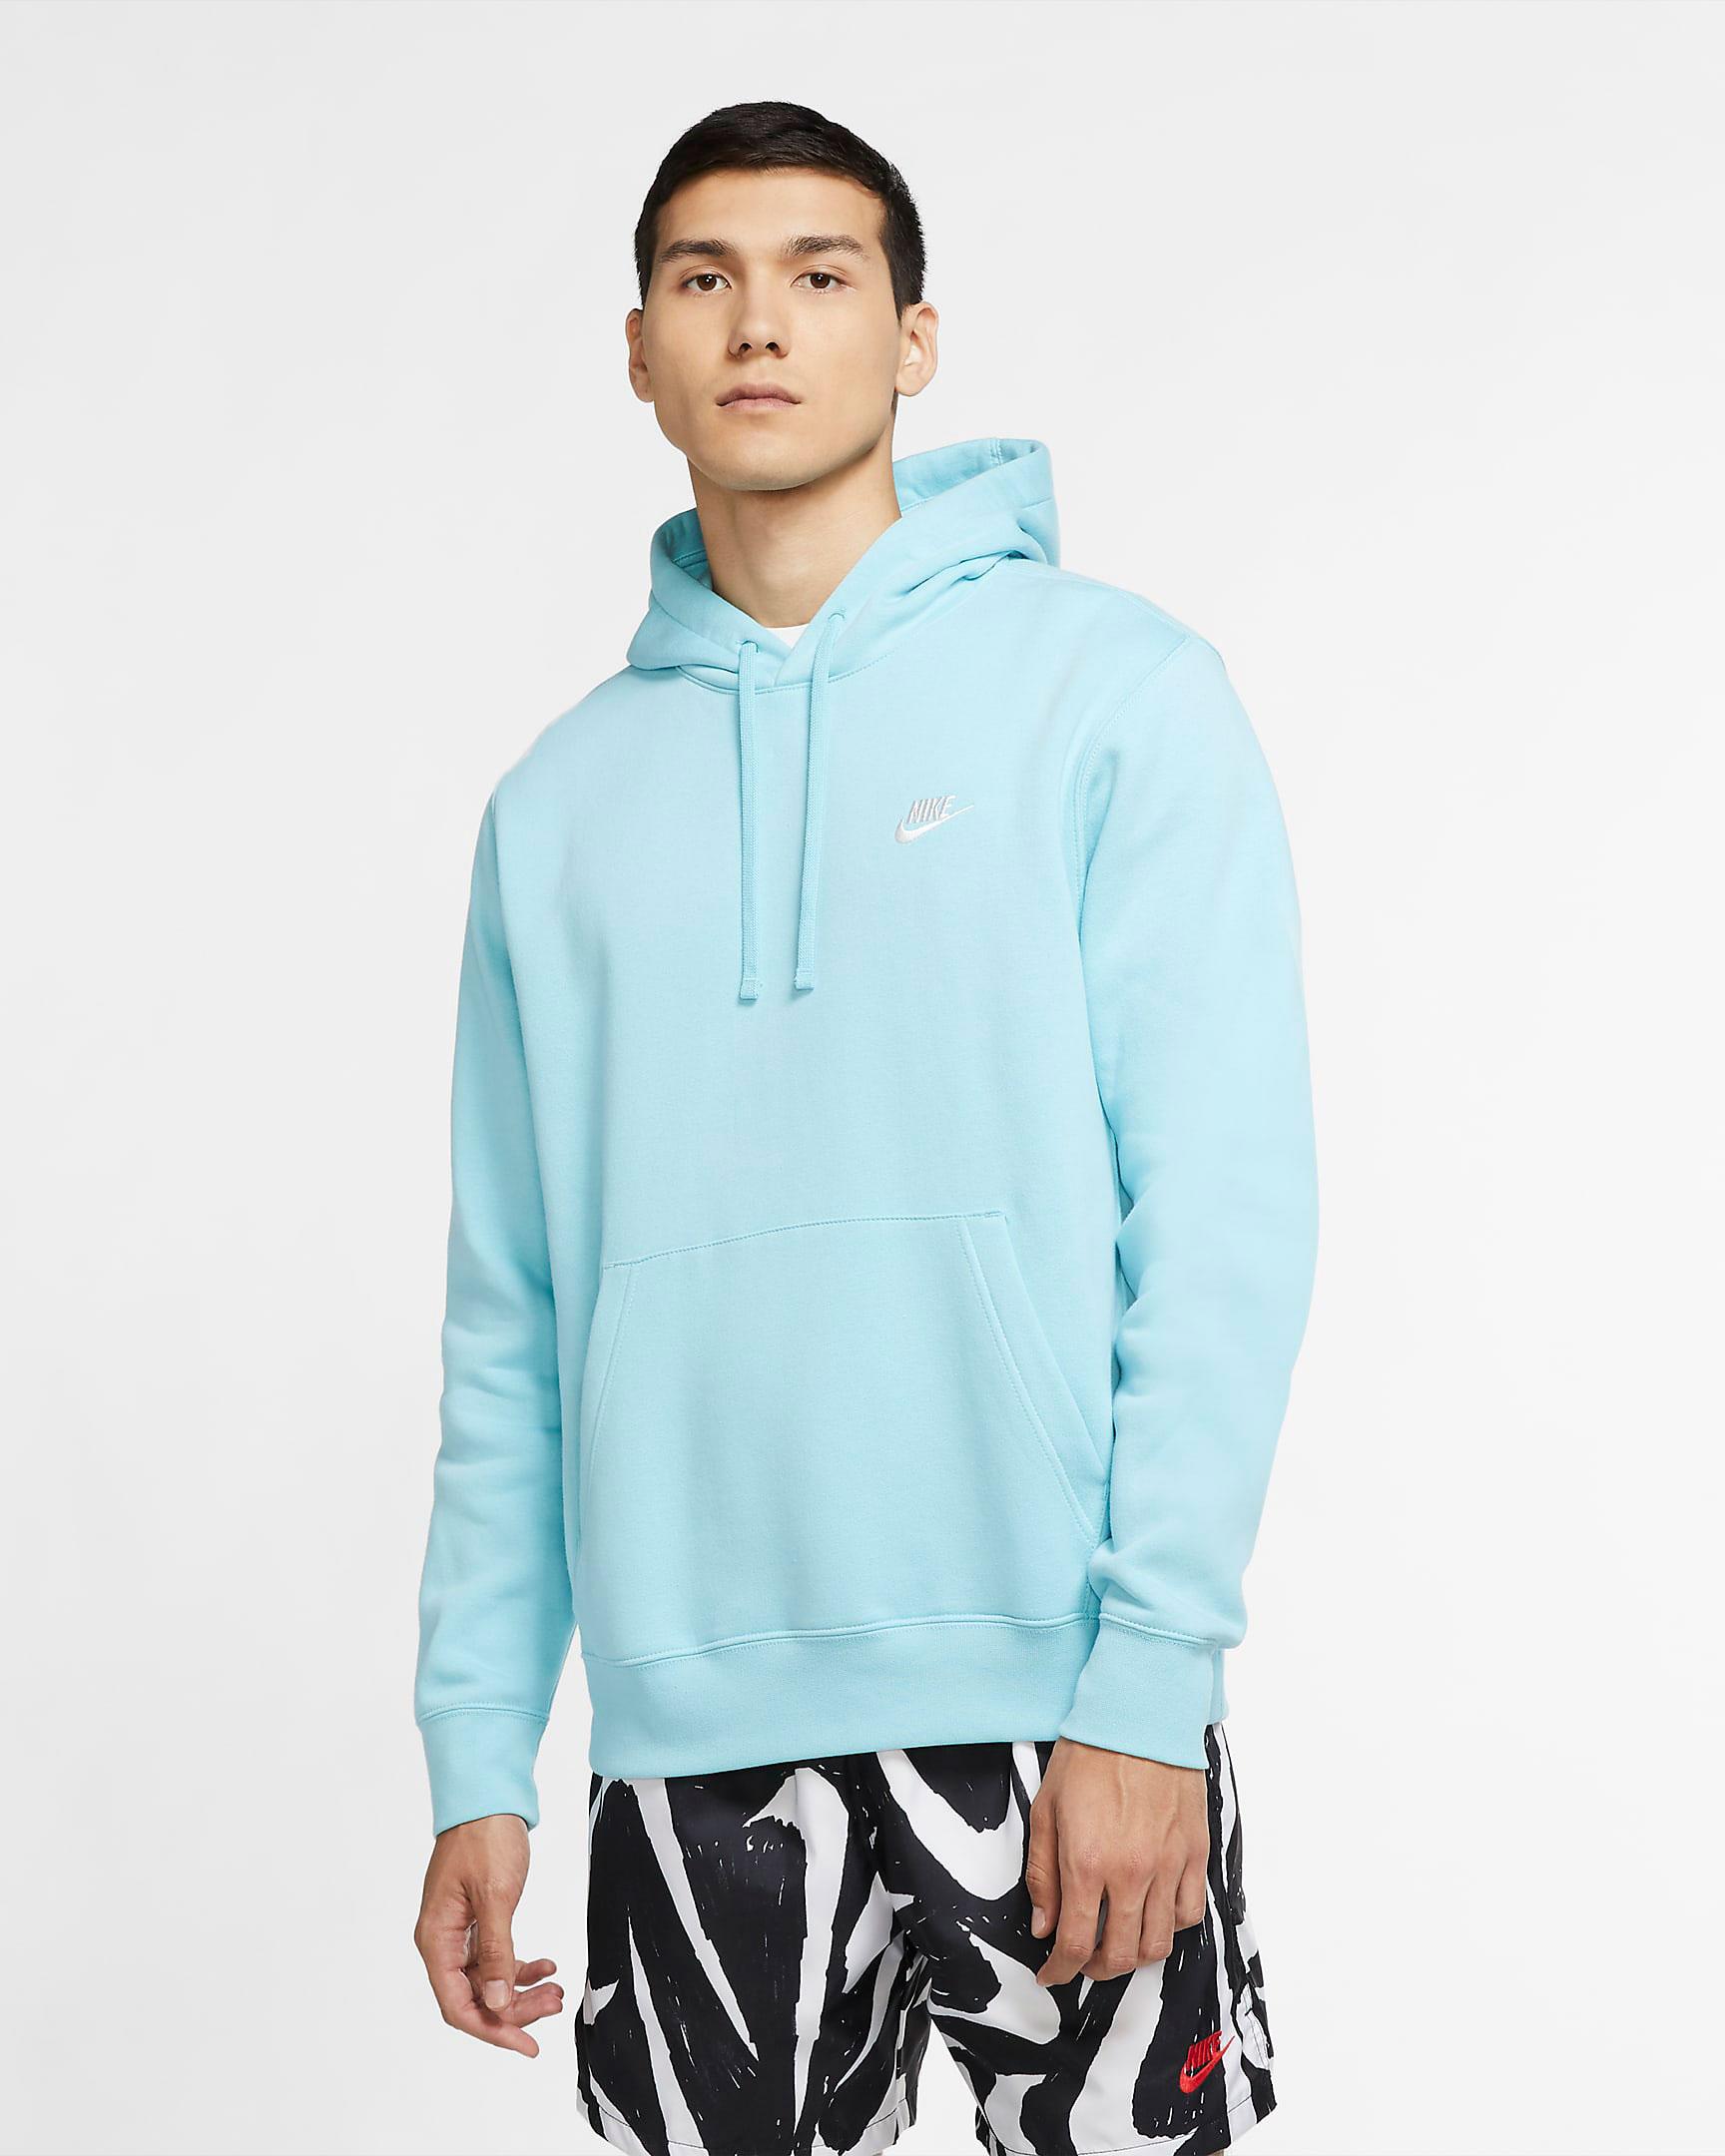 nike-sb-dunk-low-elephant-hoodie-2